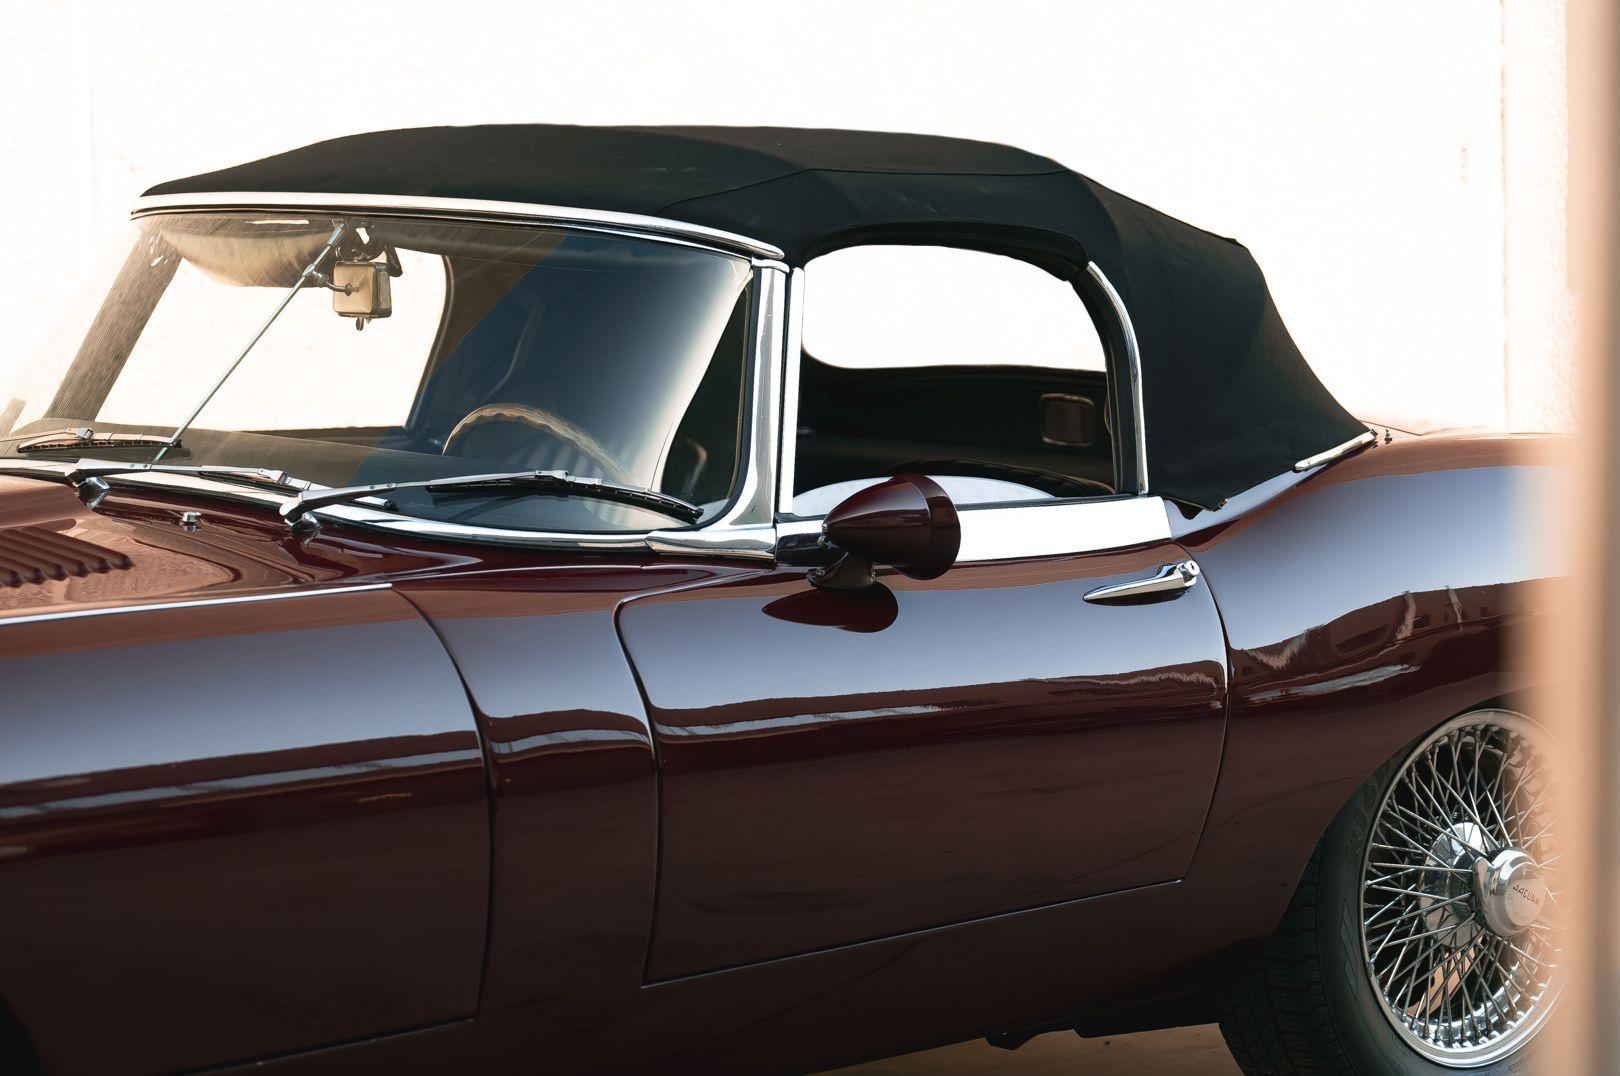 1968 Jaguar E-Type 4.2 Series 1 OTS 75584